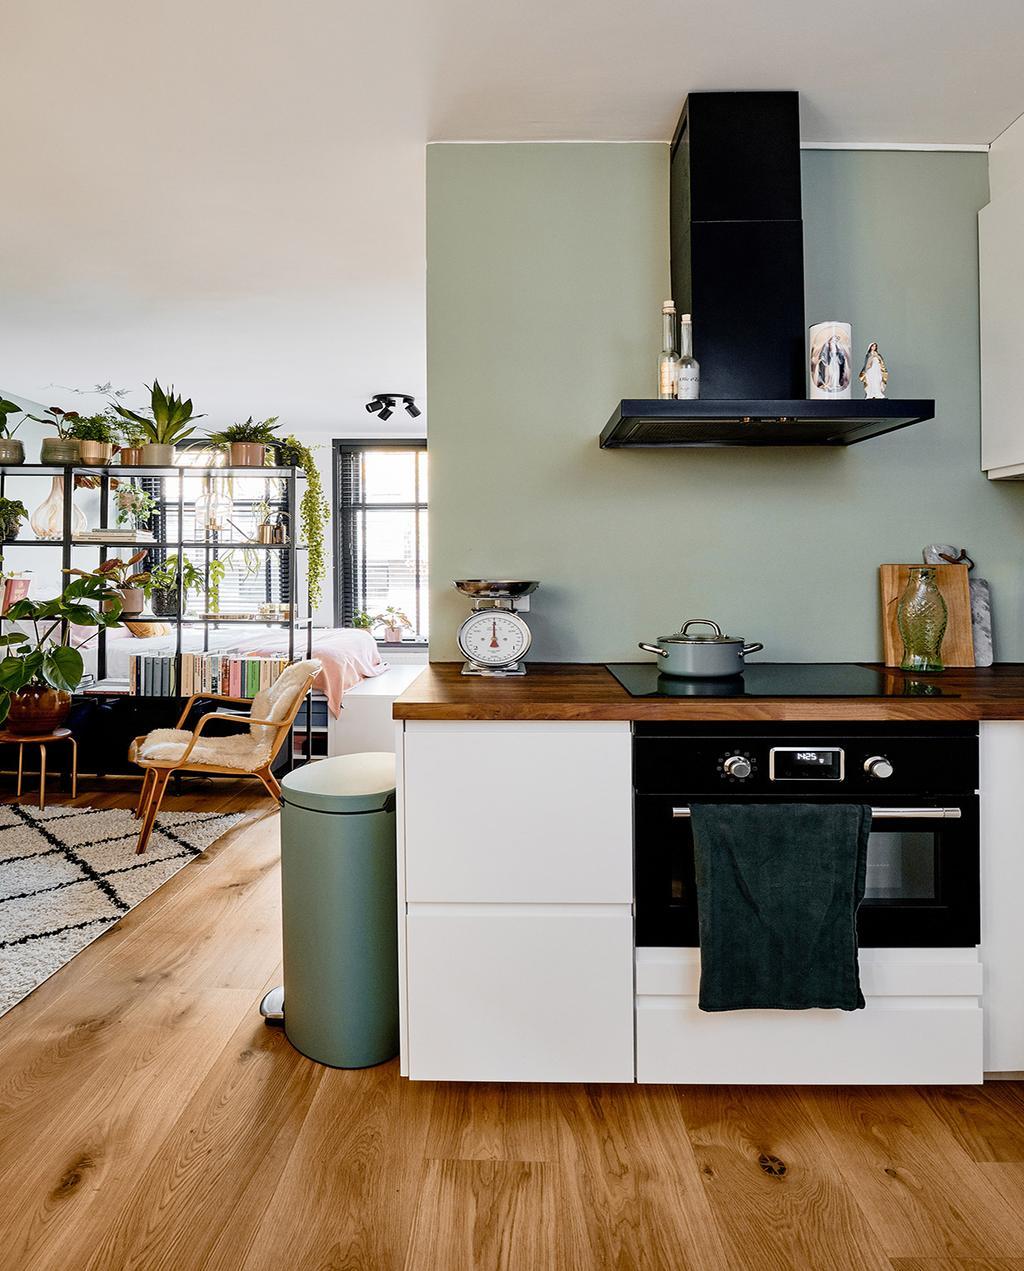 vtwonen 02-2021 | witte keuken overlopend in de woonkamer groene prullenbak